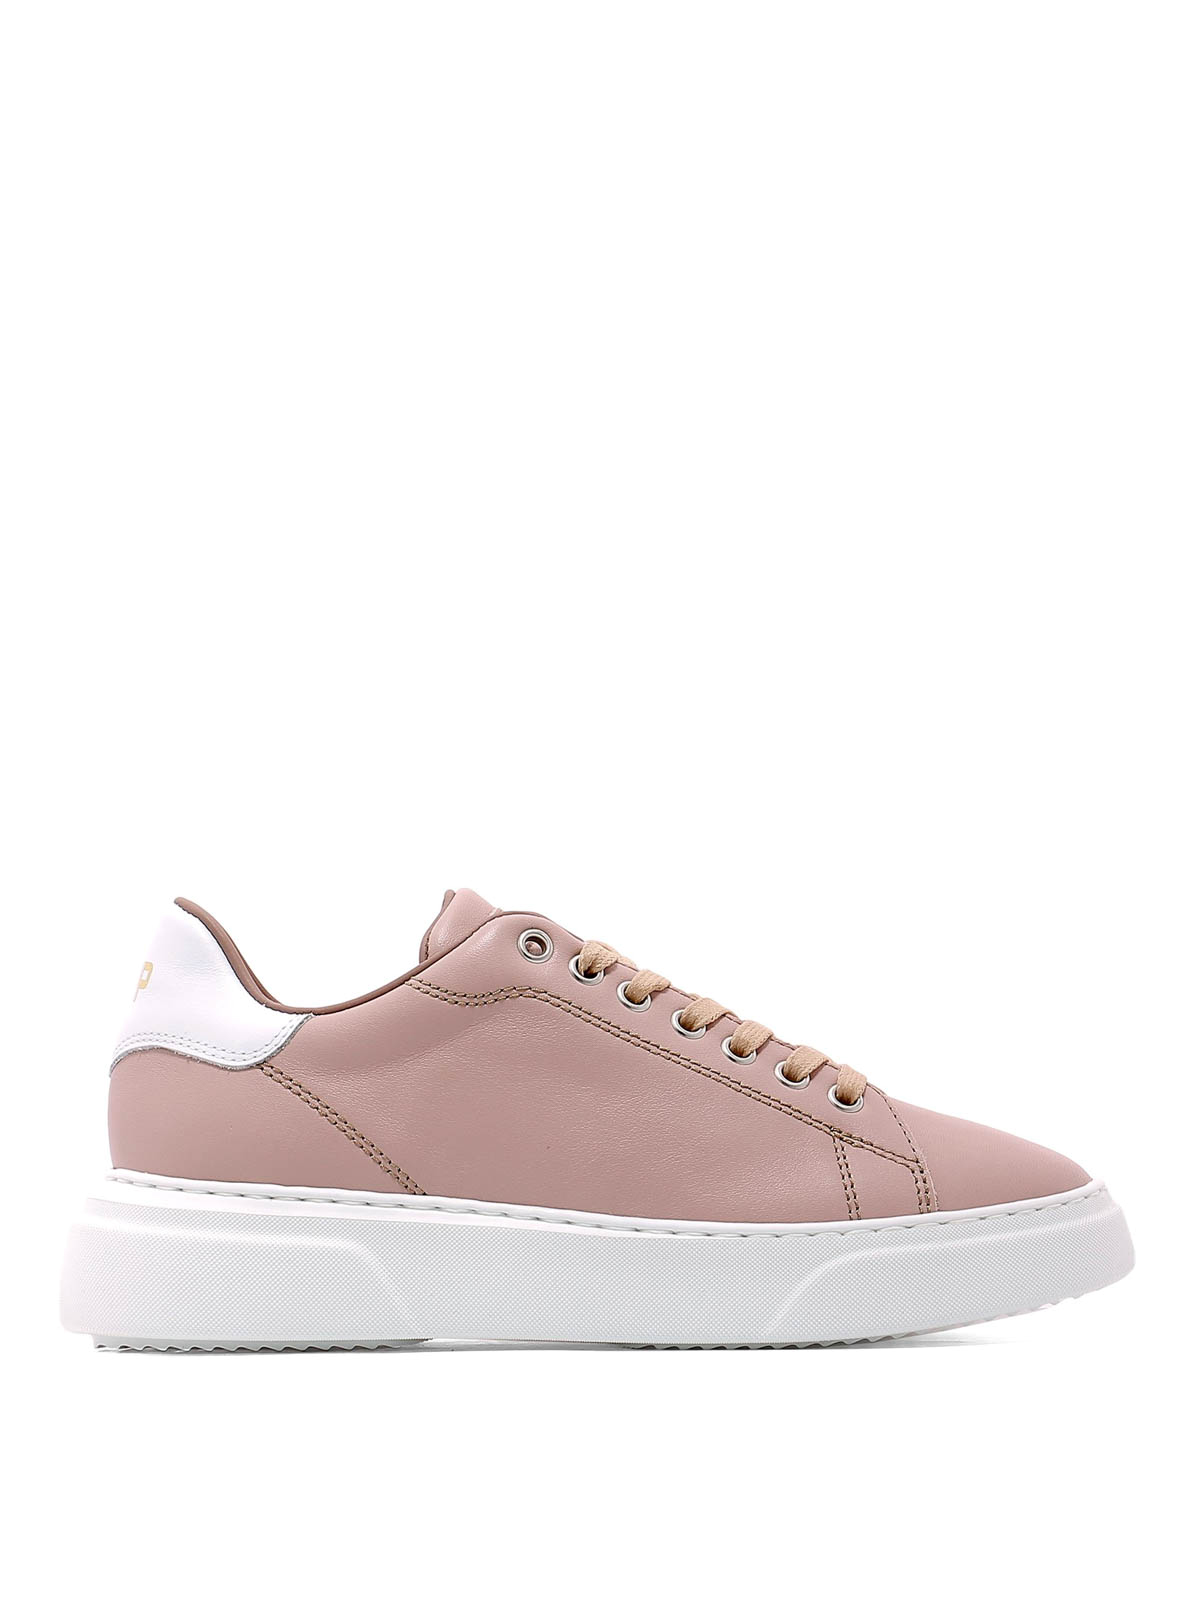 57e6a489c6 Philippe Model - Sneaker Temple in pelle rosa antico - sneakers ...